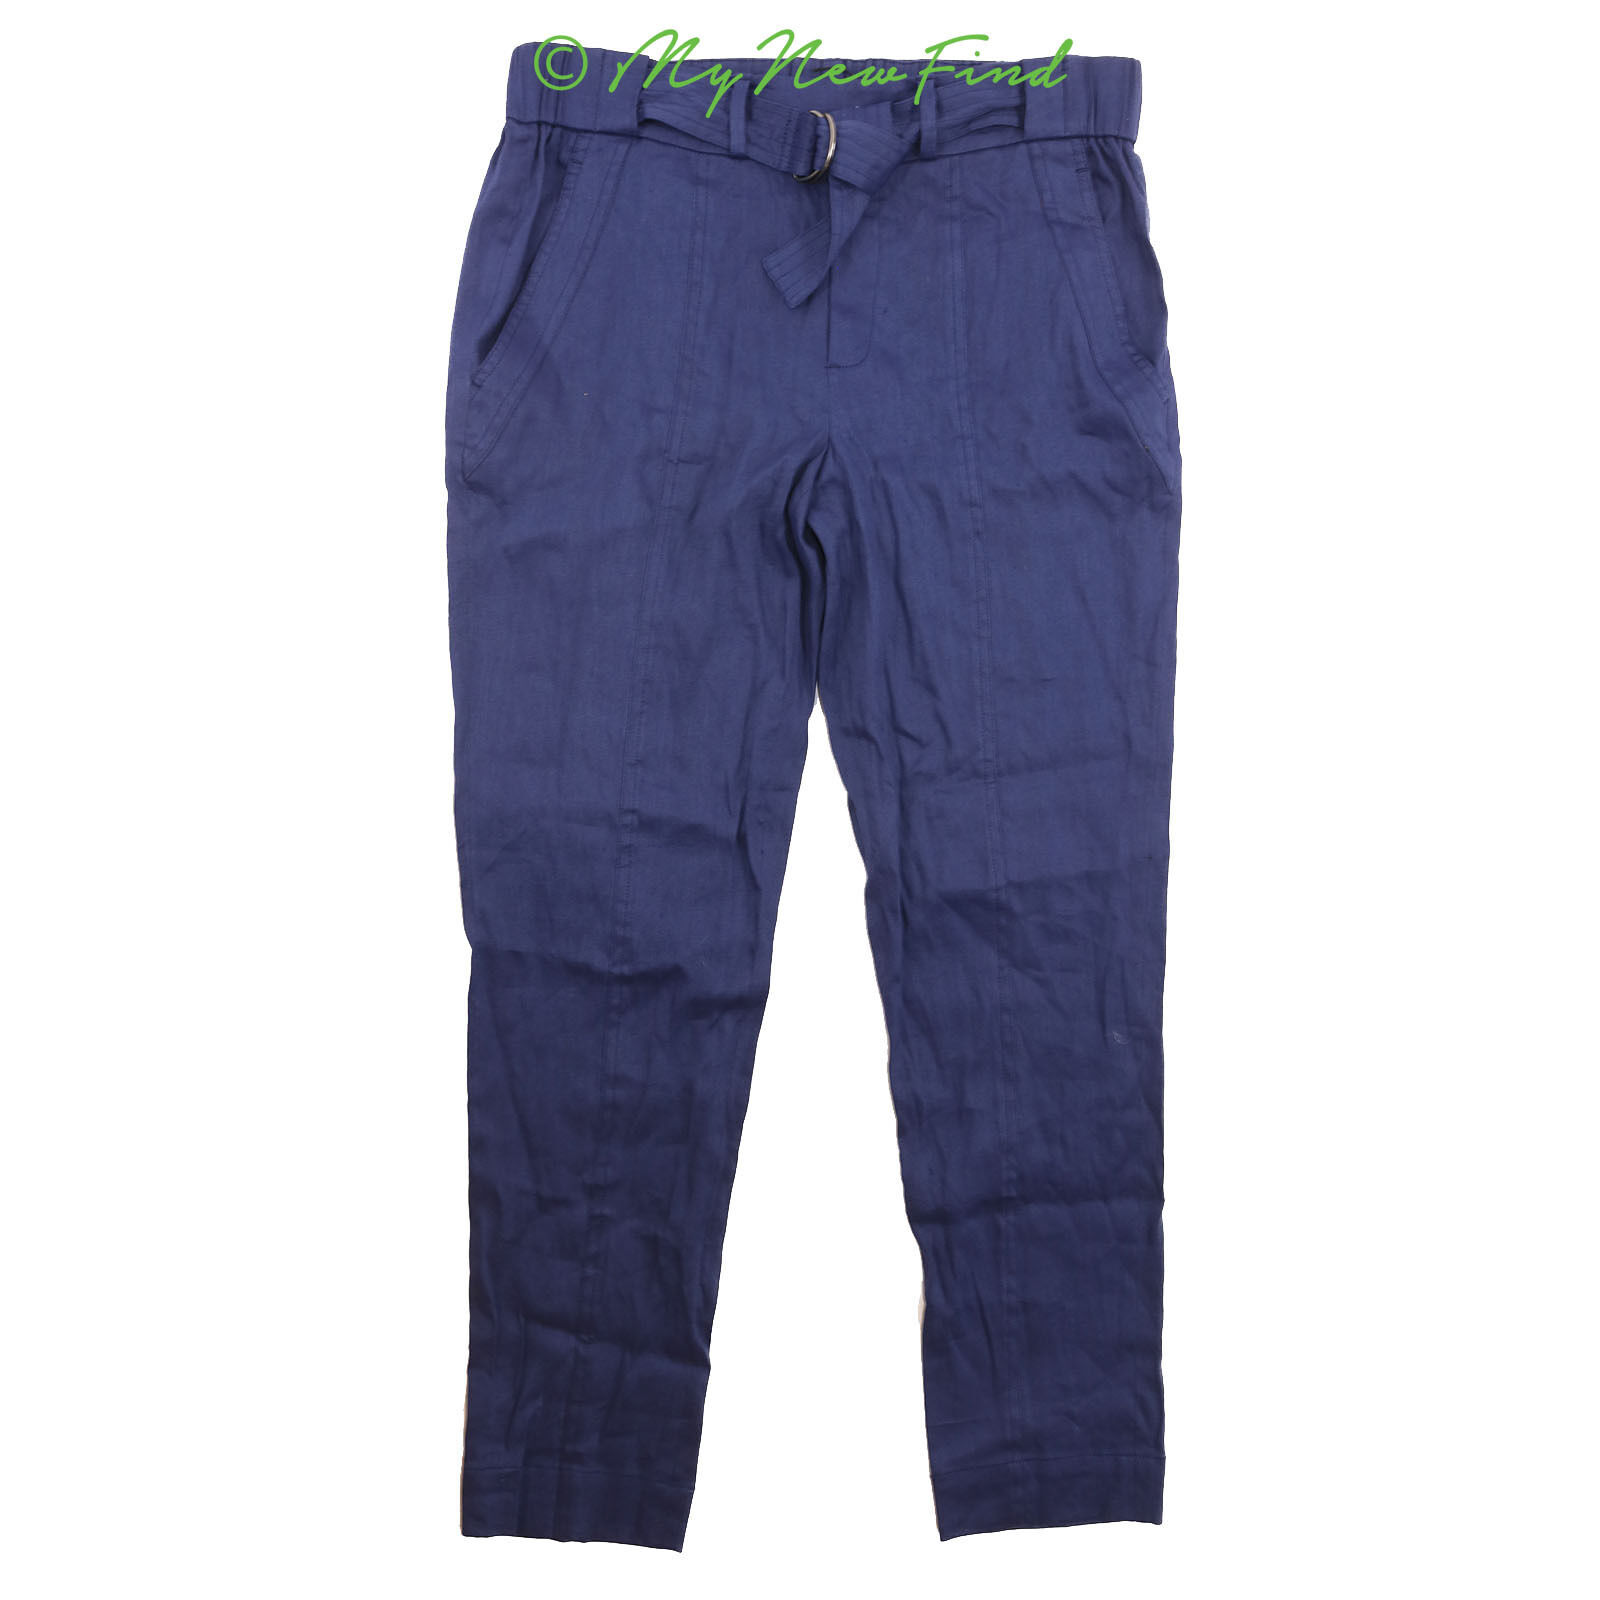 7b220cbbd7ac7 Vince Belted Casual Pants Size Linen Blend Trousers Cuffed Hem bluee 255  B84 6 nrctnv7456-Trousers